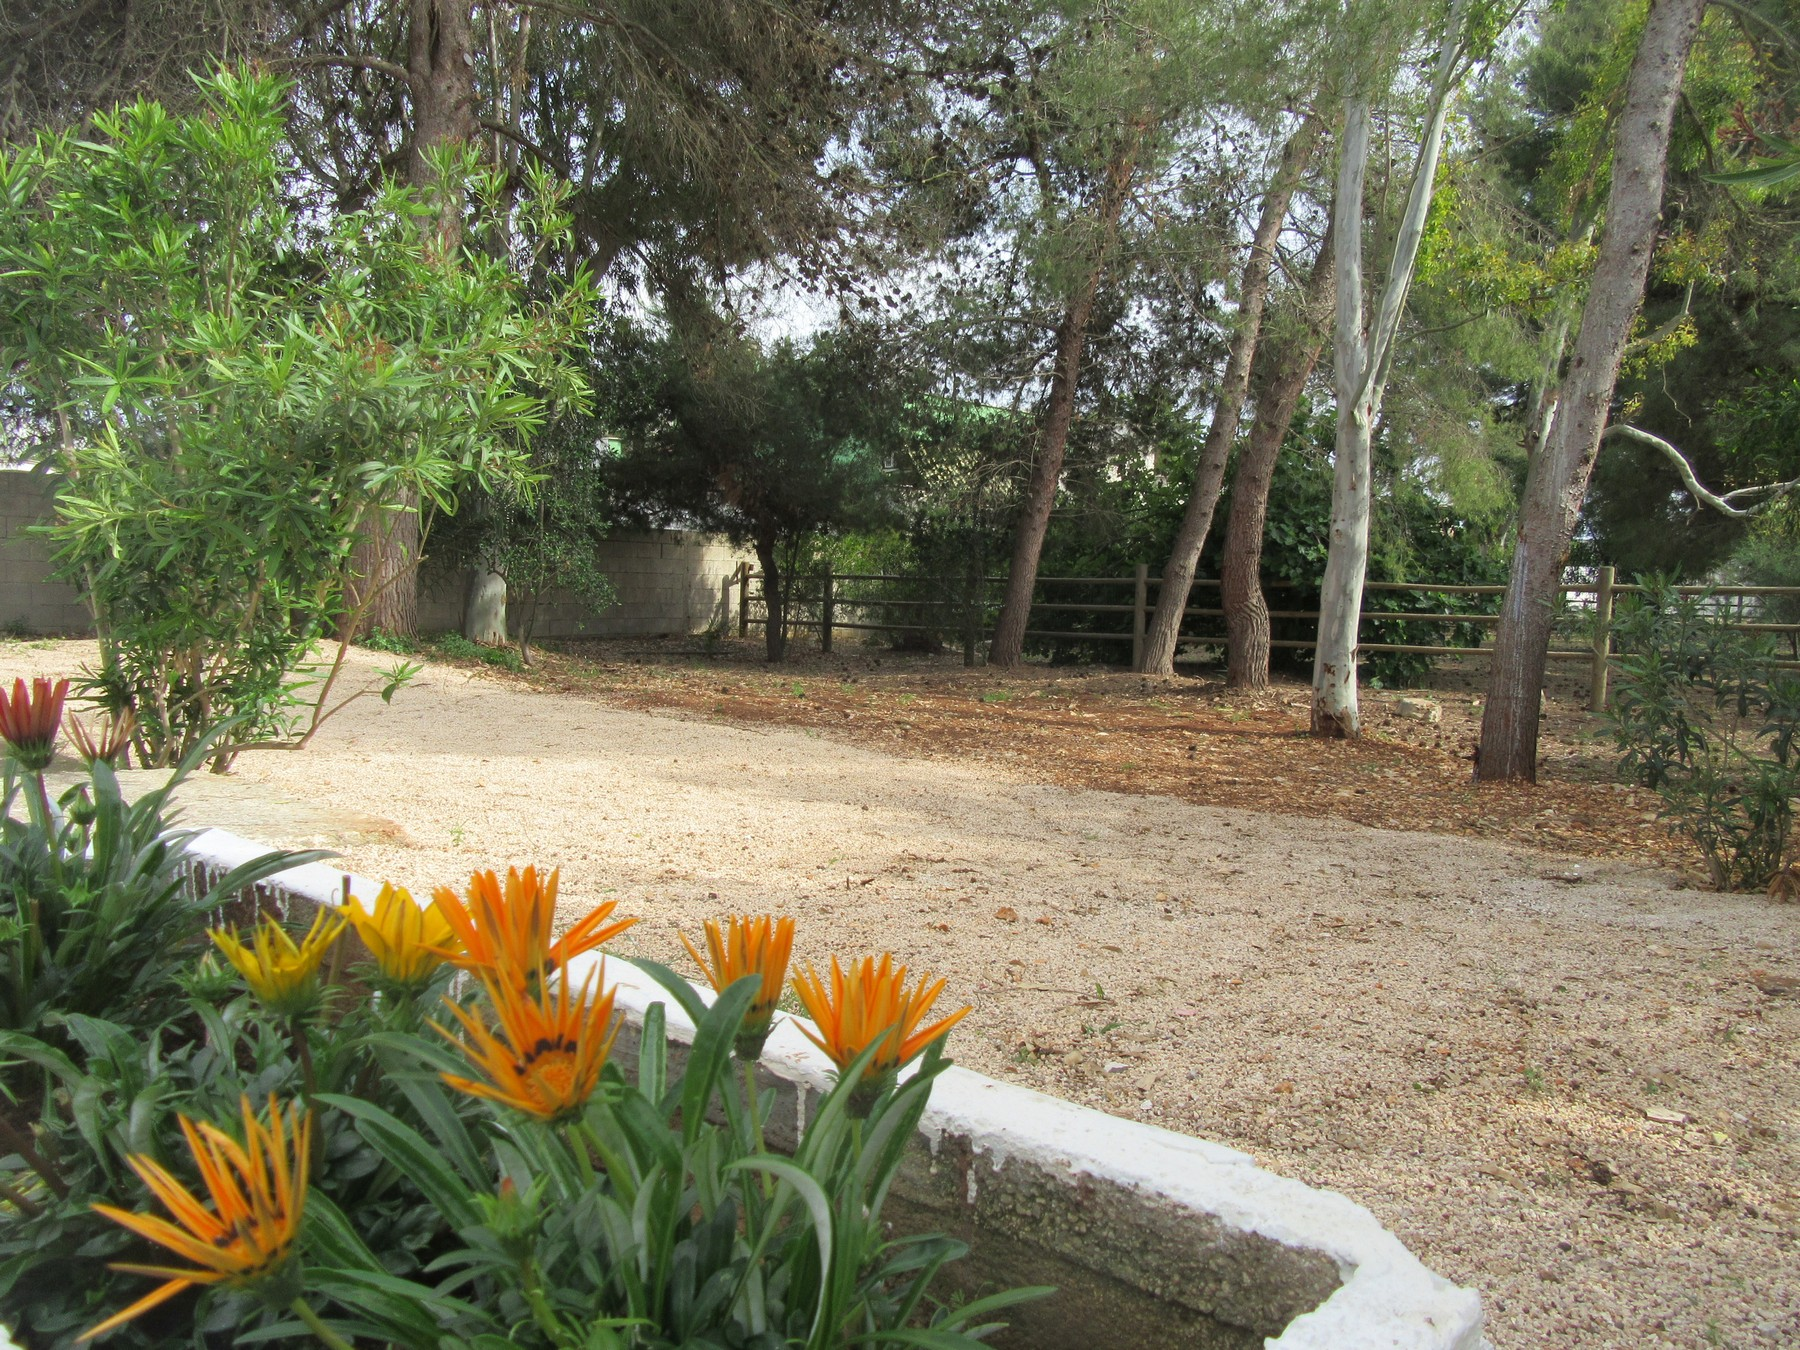 Ferienhaus Villa Mariposa n°3, only 200 meters from the beach (2354067), Porto Cesareo, Lecce, Apulien, Italien, Bild 21